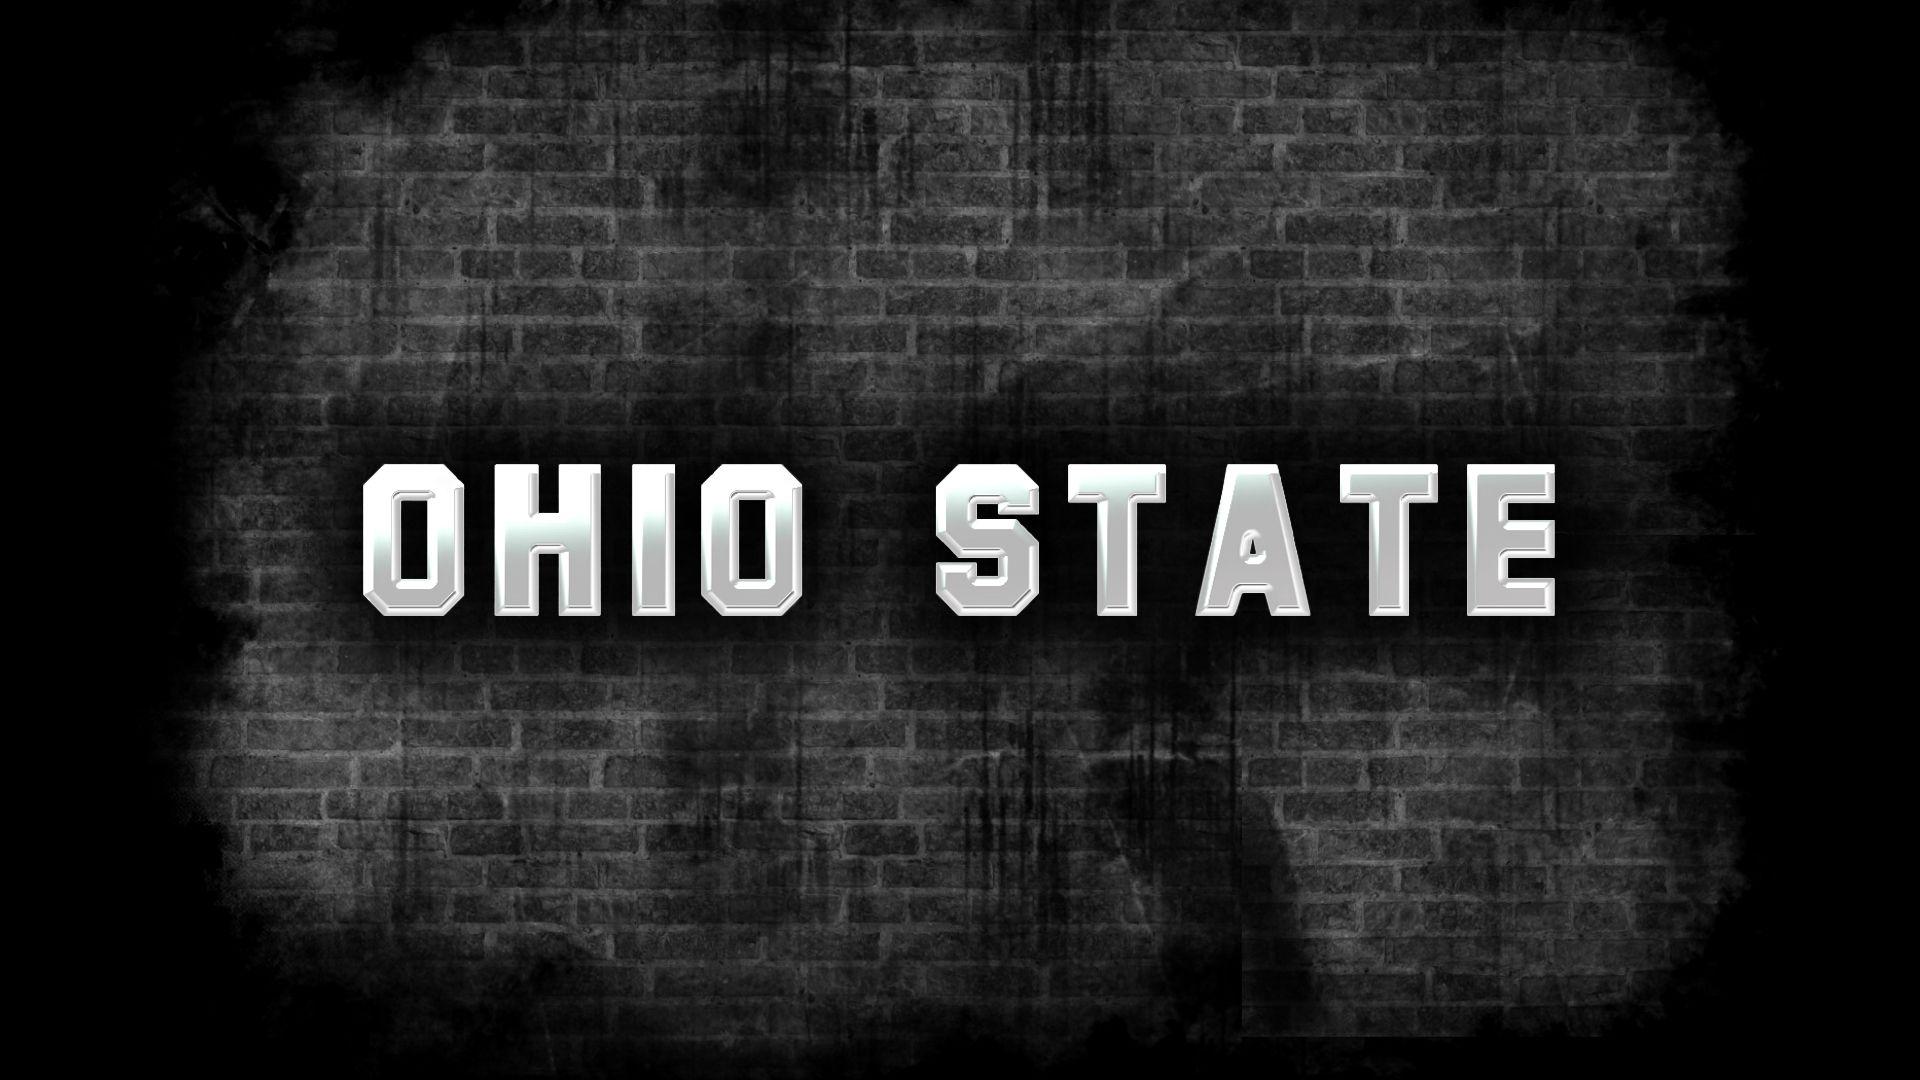 Ohio State Wallpaper >> OSU Wallpaper 314 | OHIO STATE DESKTOP WALLPAPERS | Pinterest